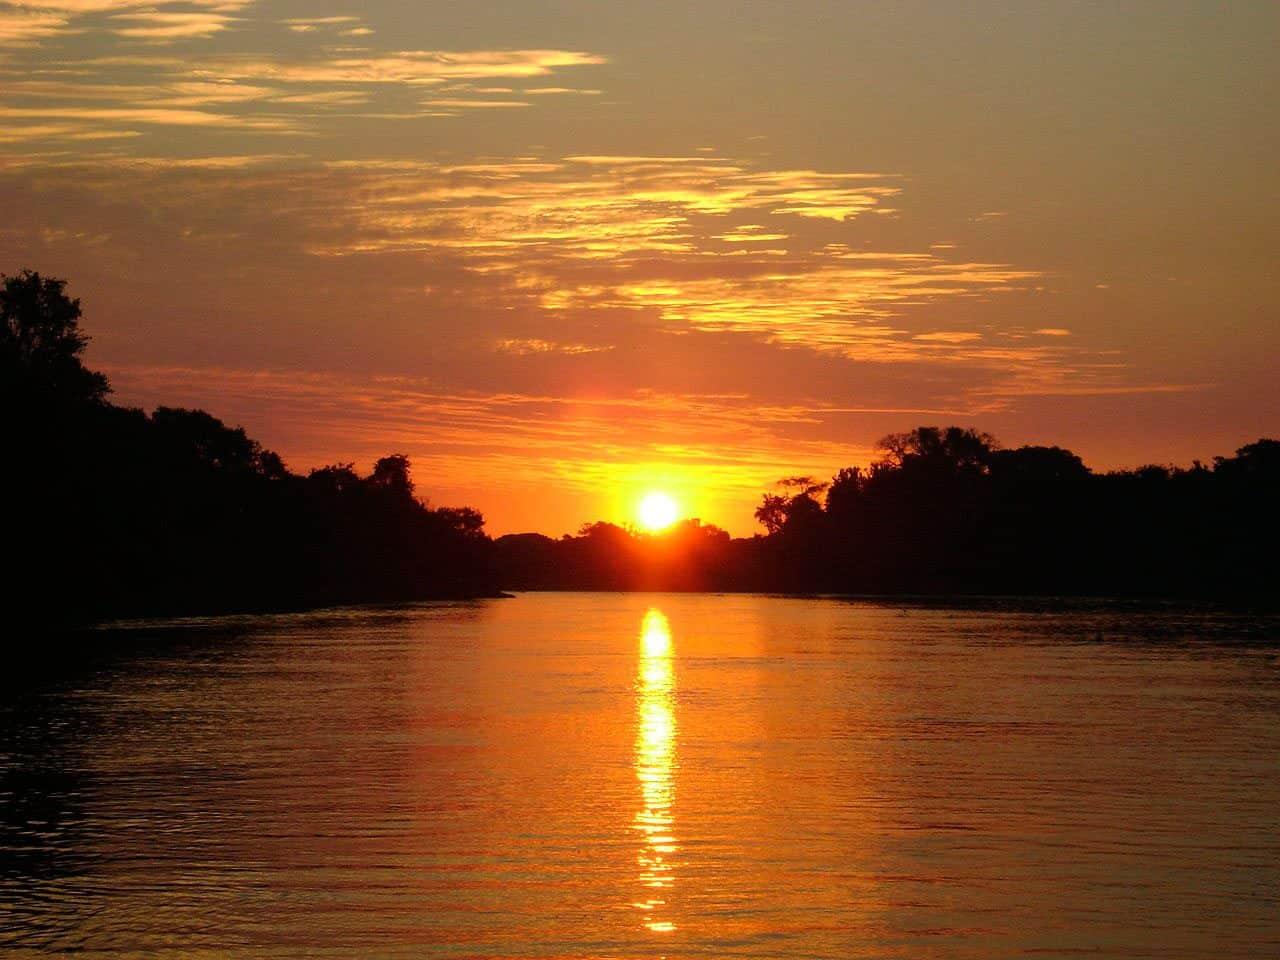 lua-de-mel-brasil-Pantanal_Sunset-foto-Matthew-Beeman